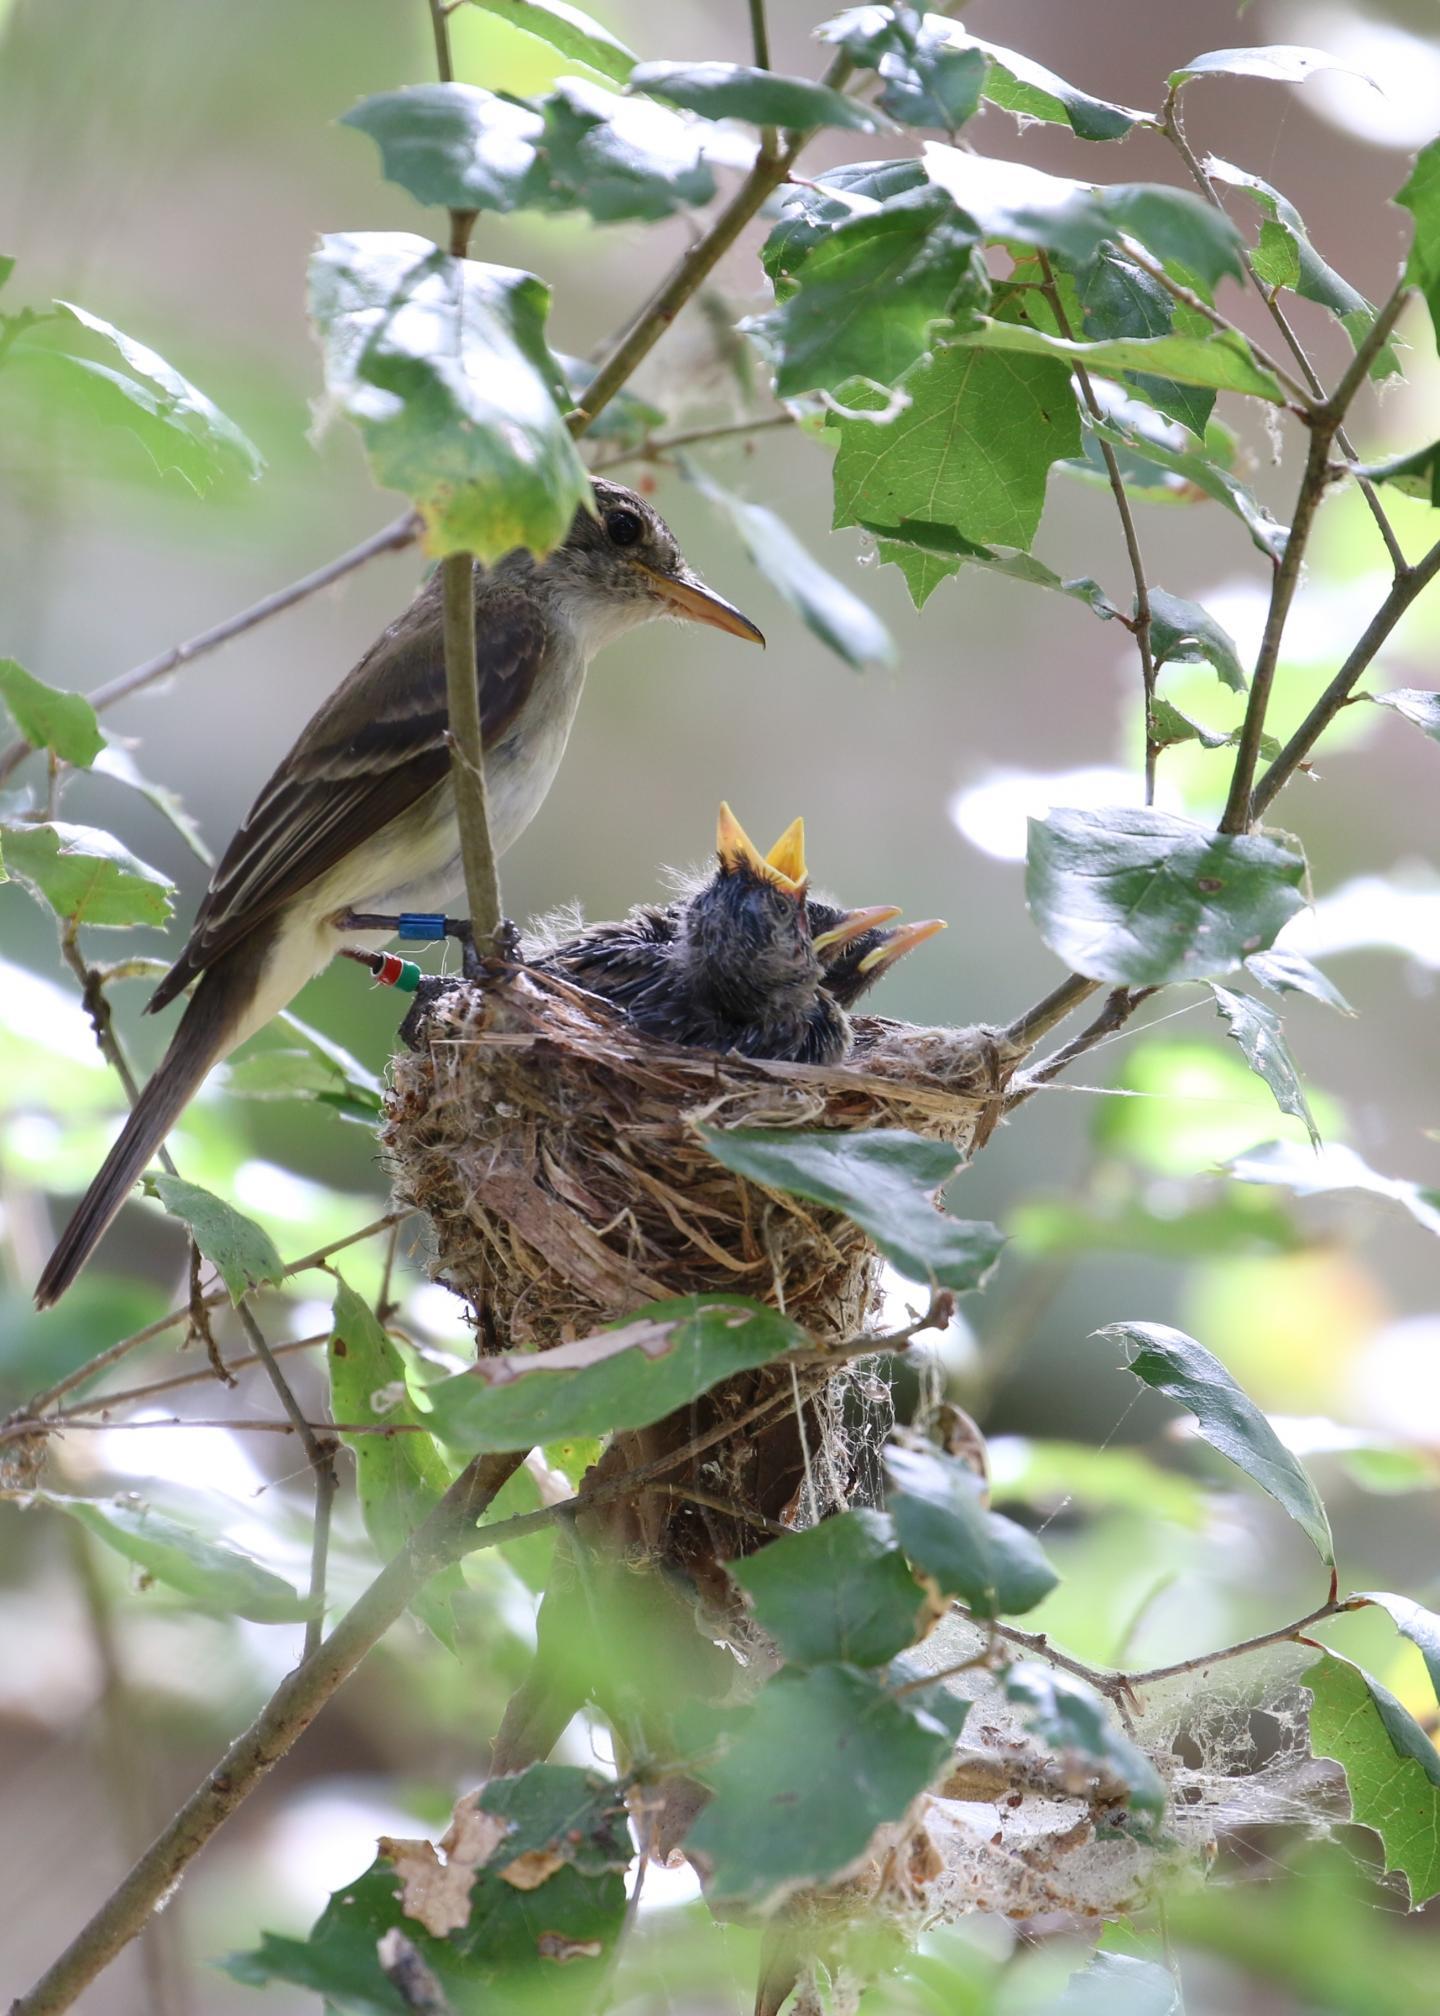 Southwestern Willow Flycatcher nest